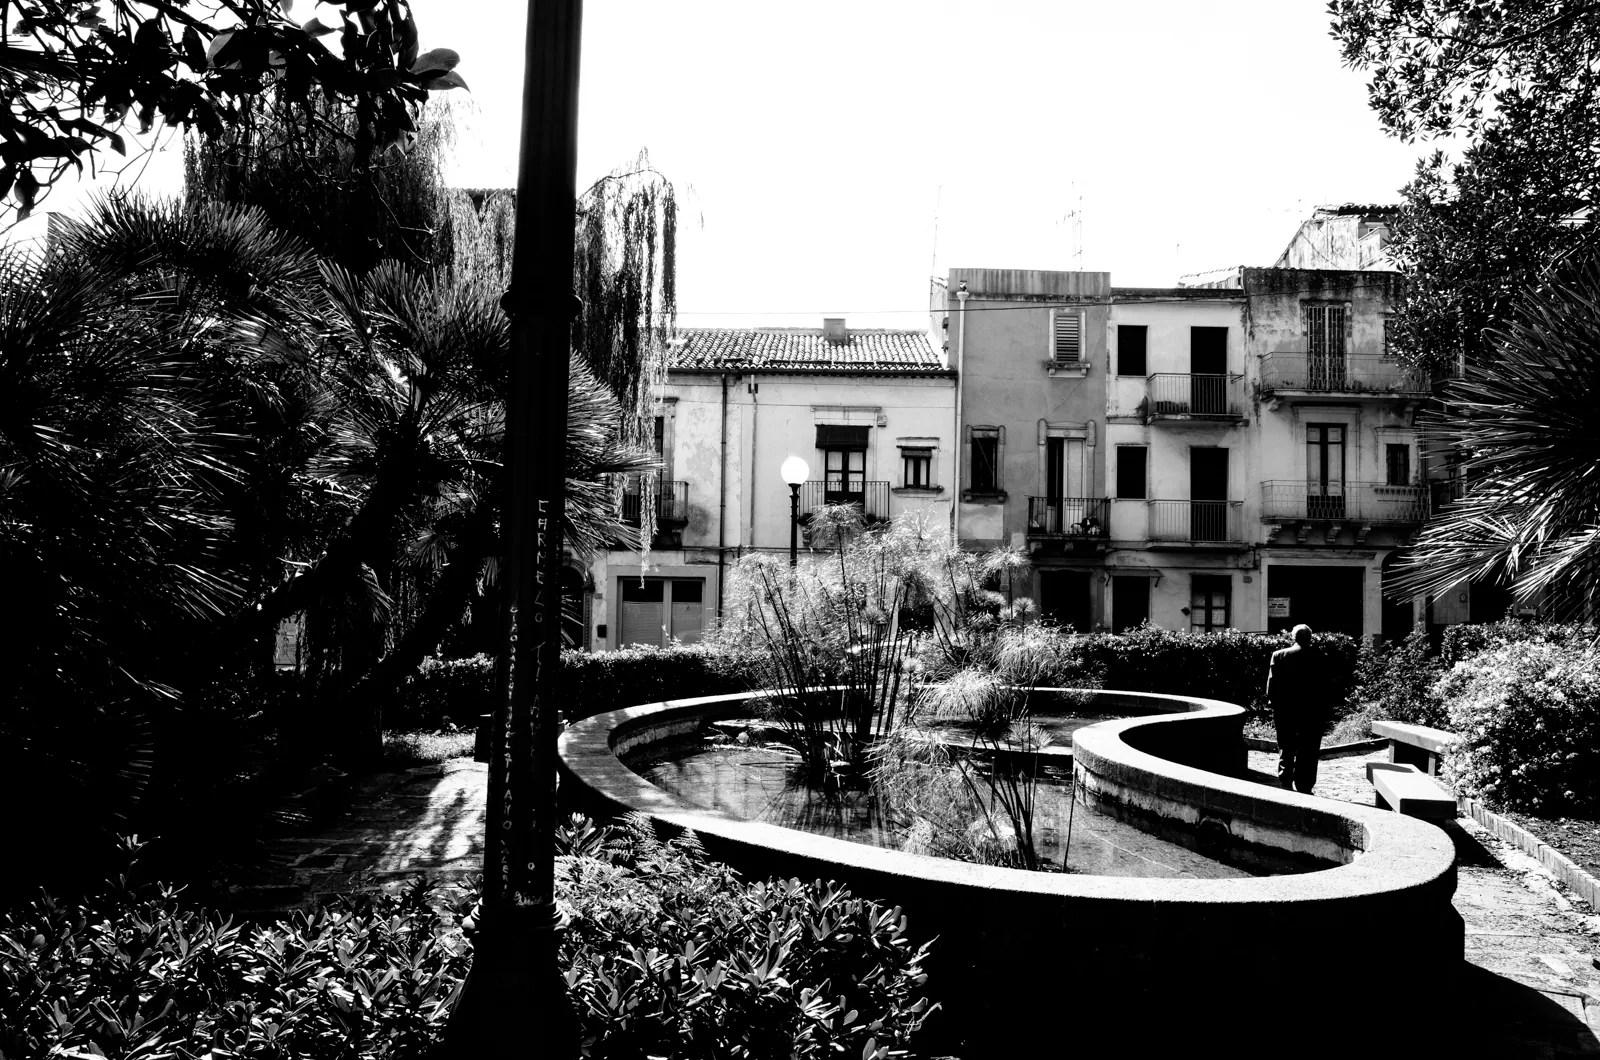 Italian street photography